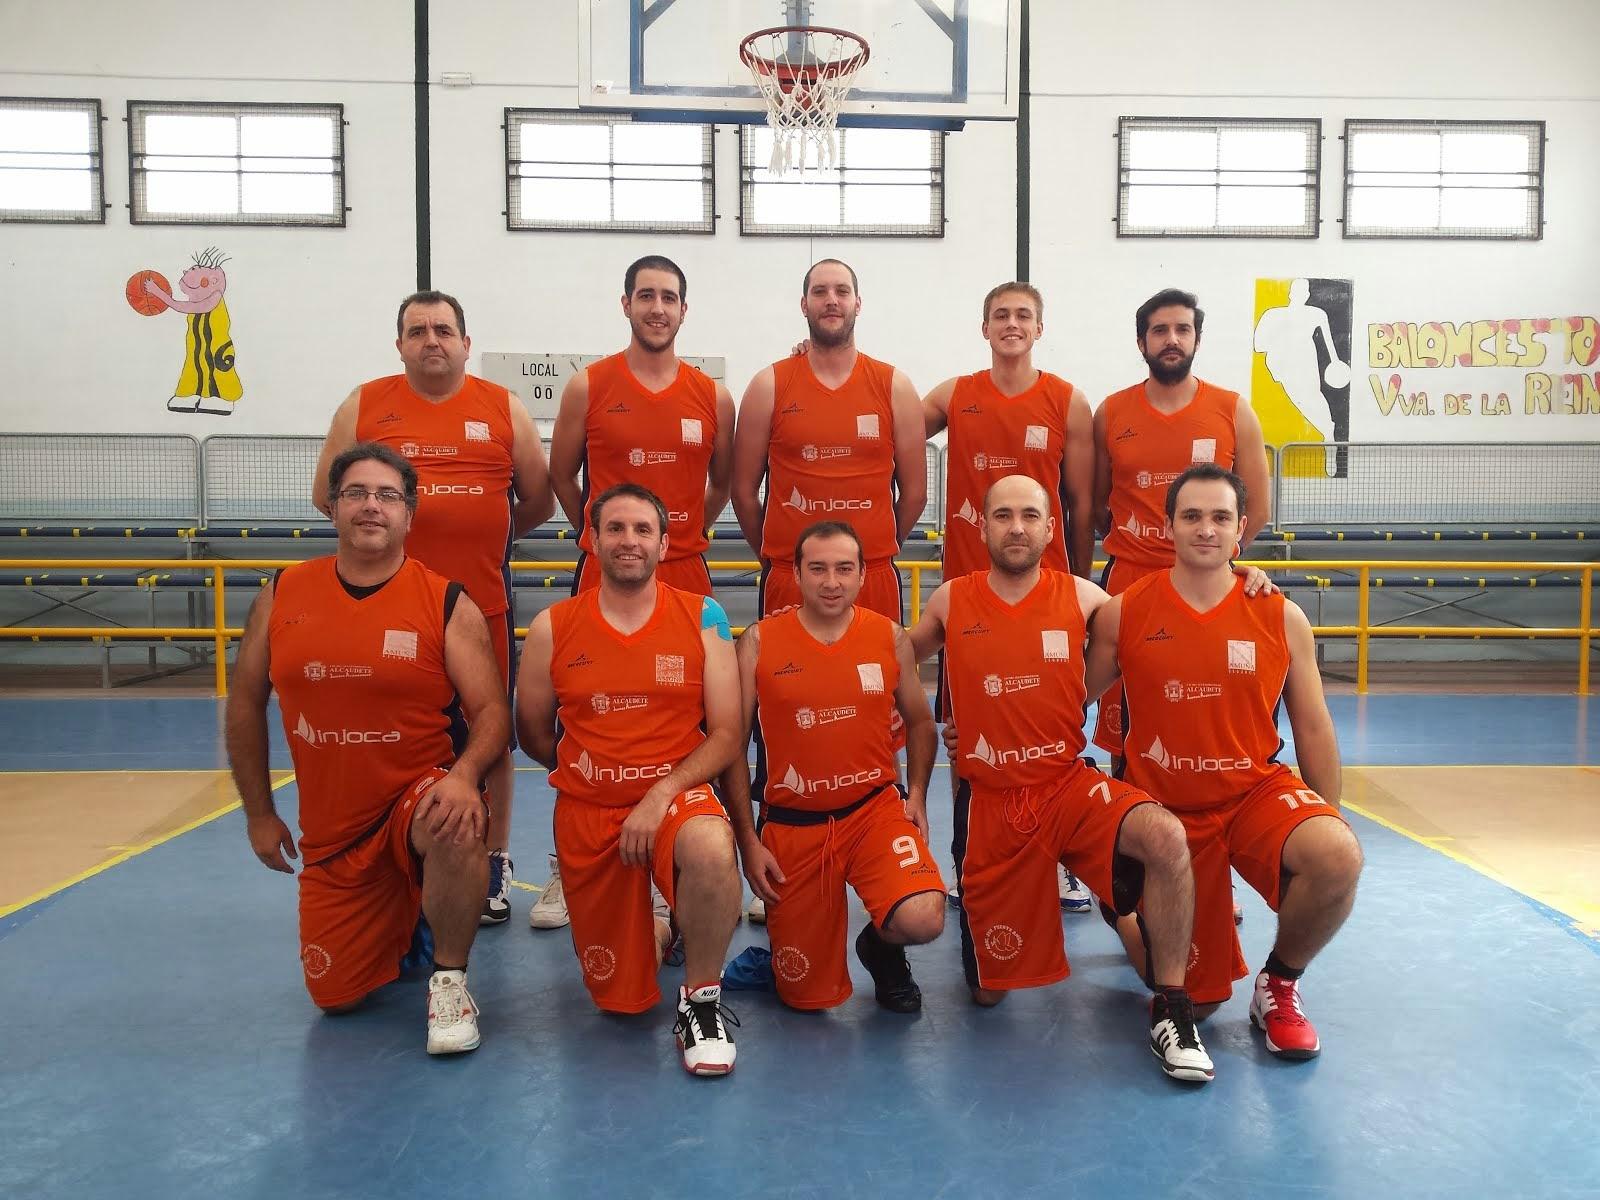 Equipo temporada 2014/15